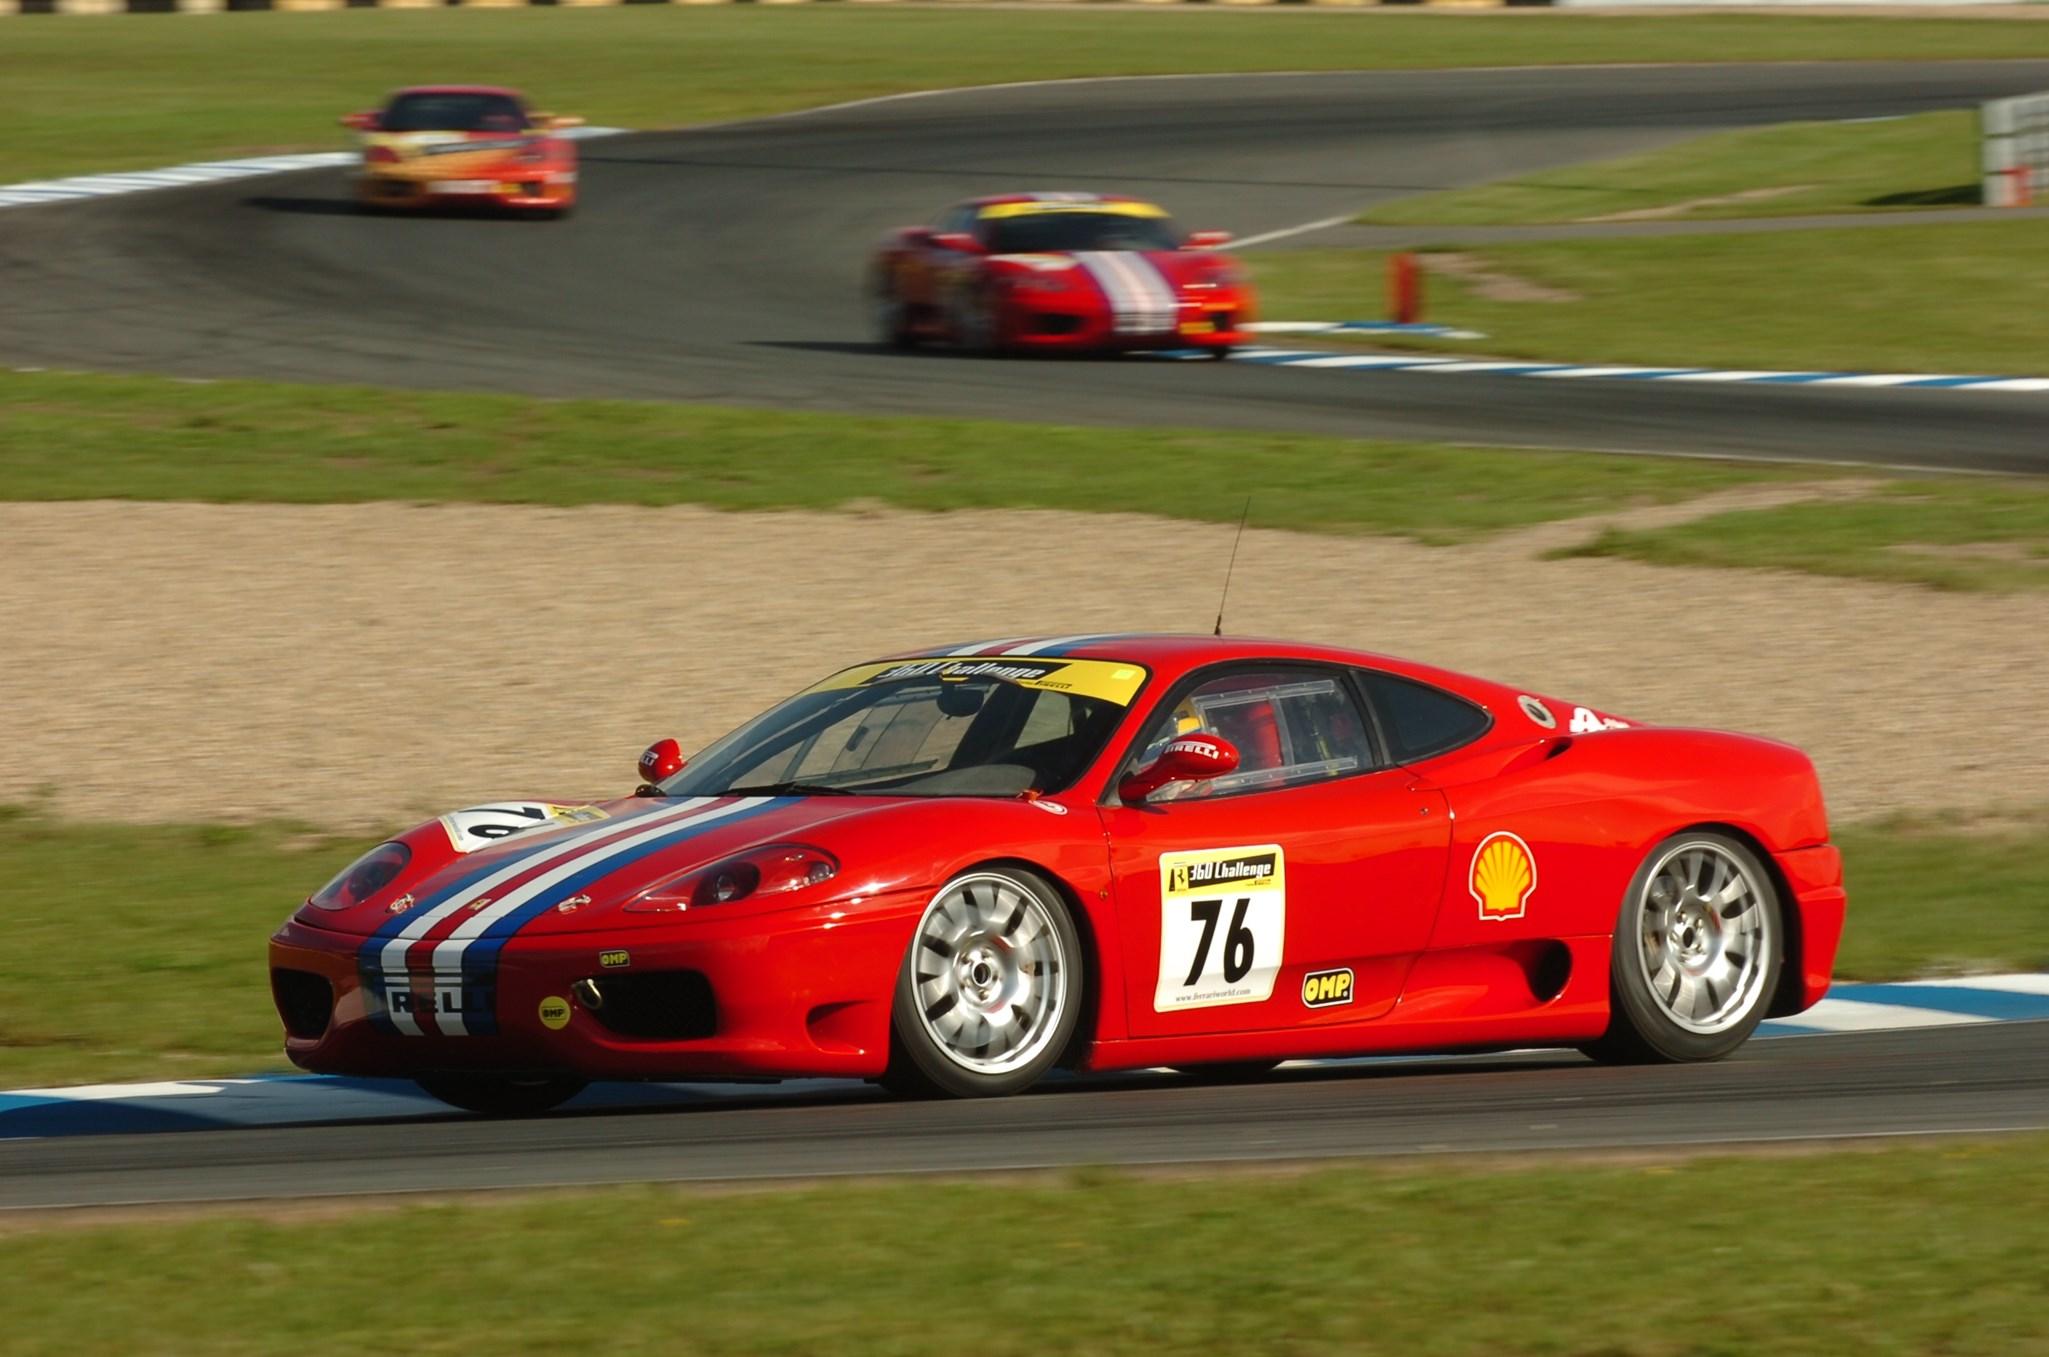 Ferrari history | Ferrari's